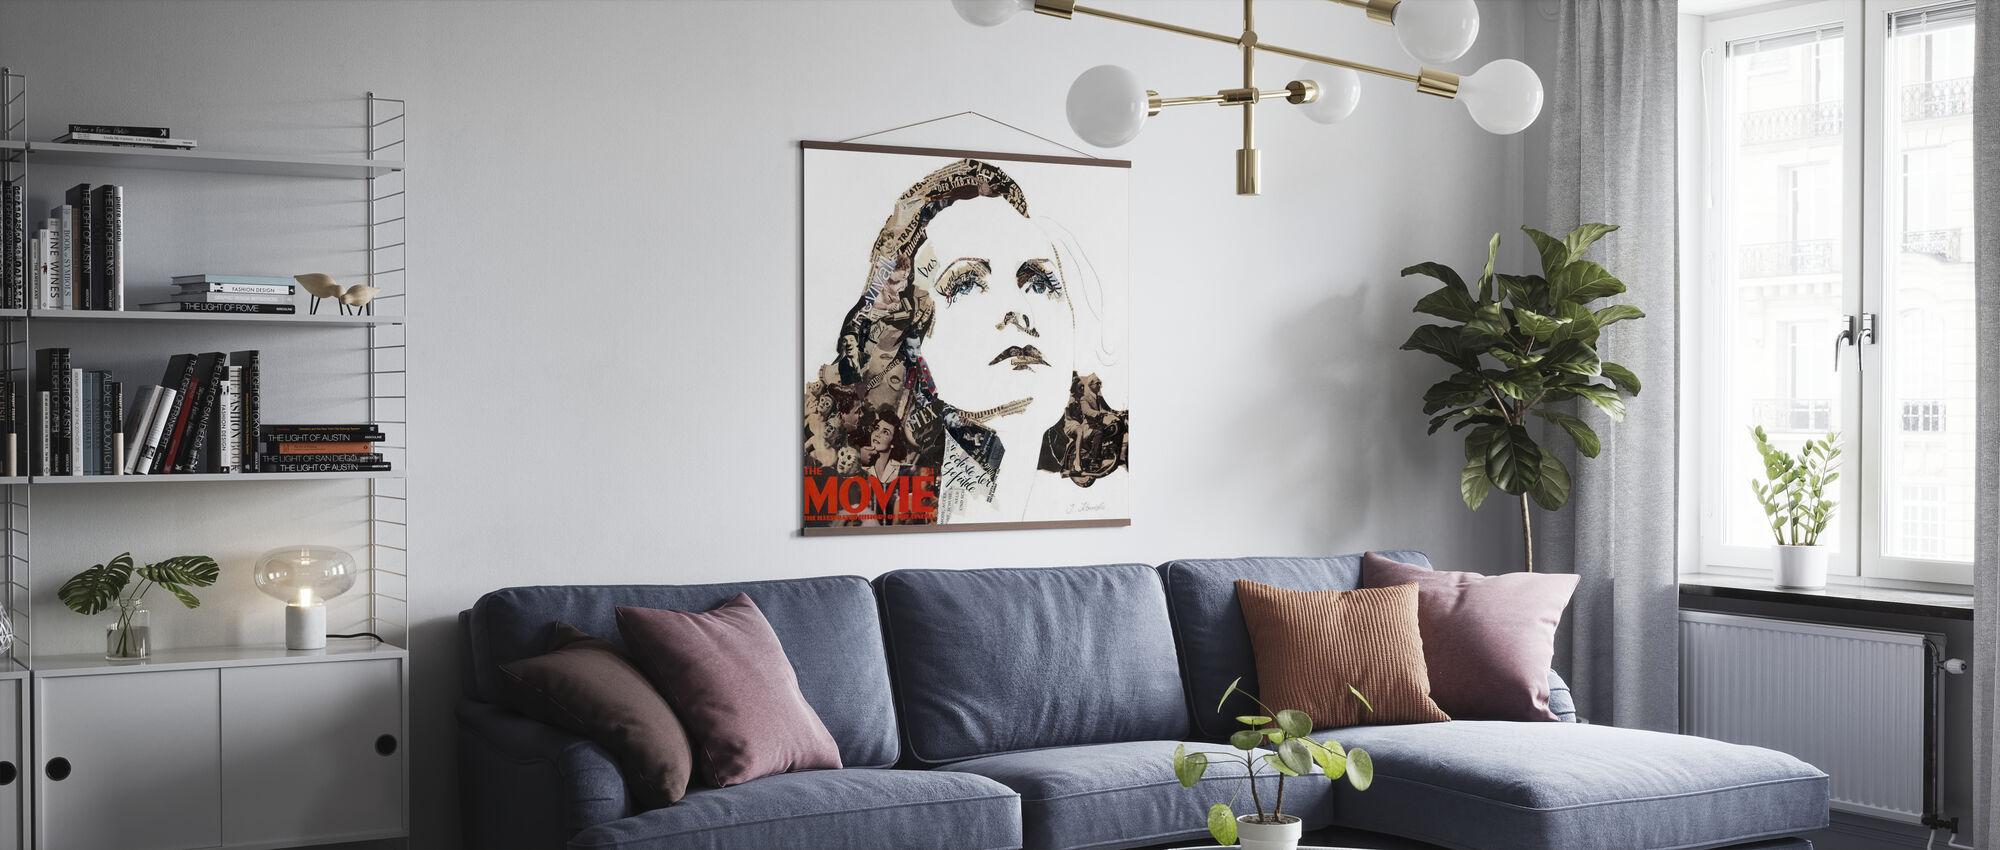 Greta - Poster - Living Room